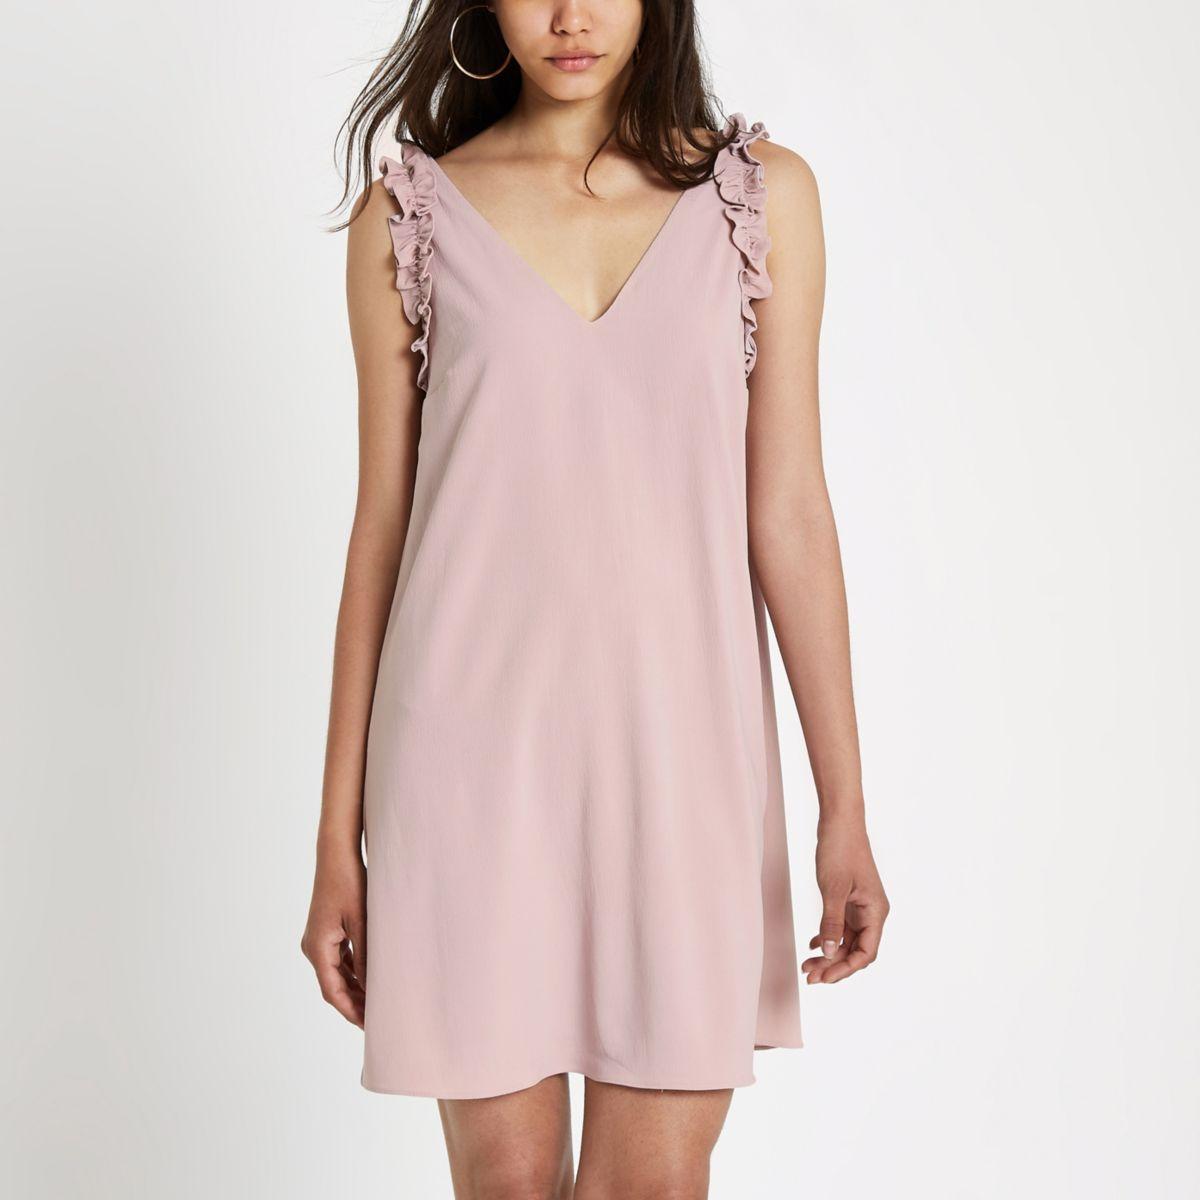 Pink ruffle sleeve slip dress